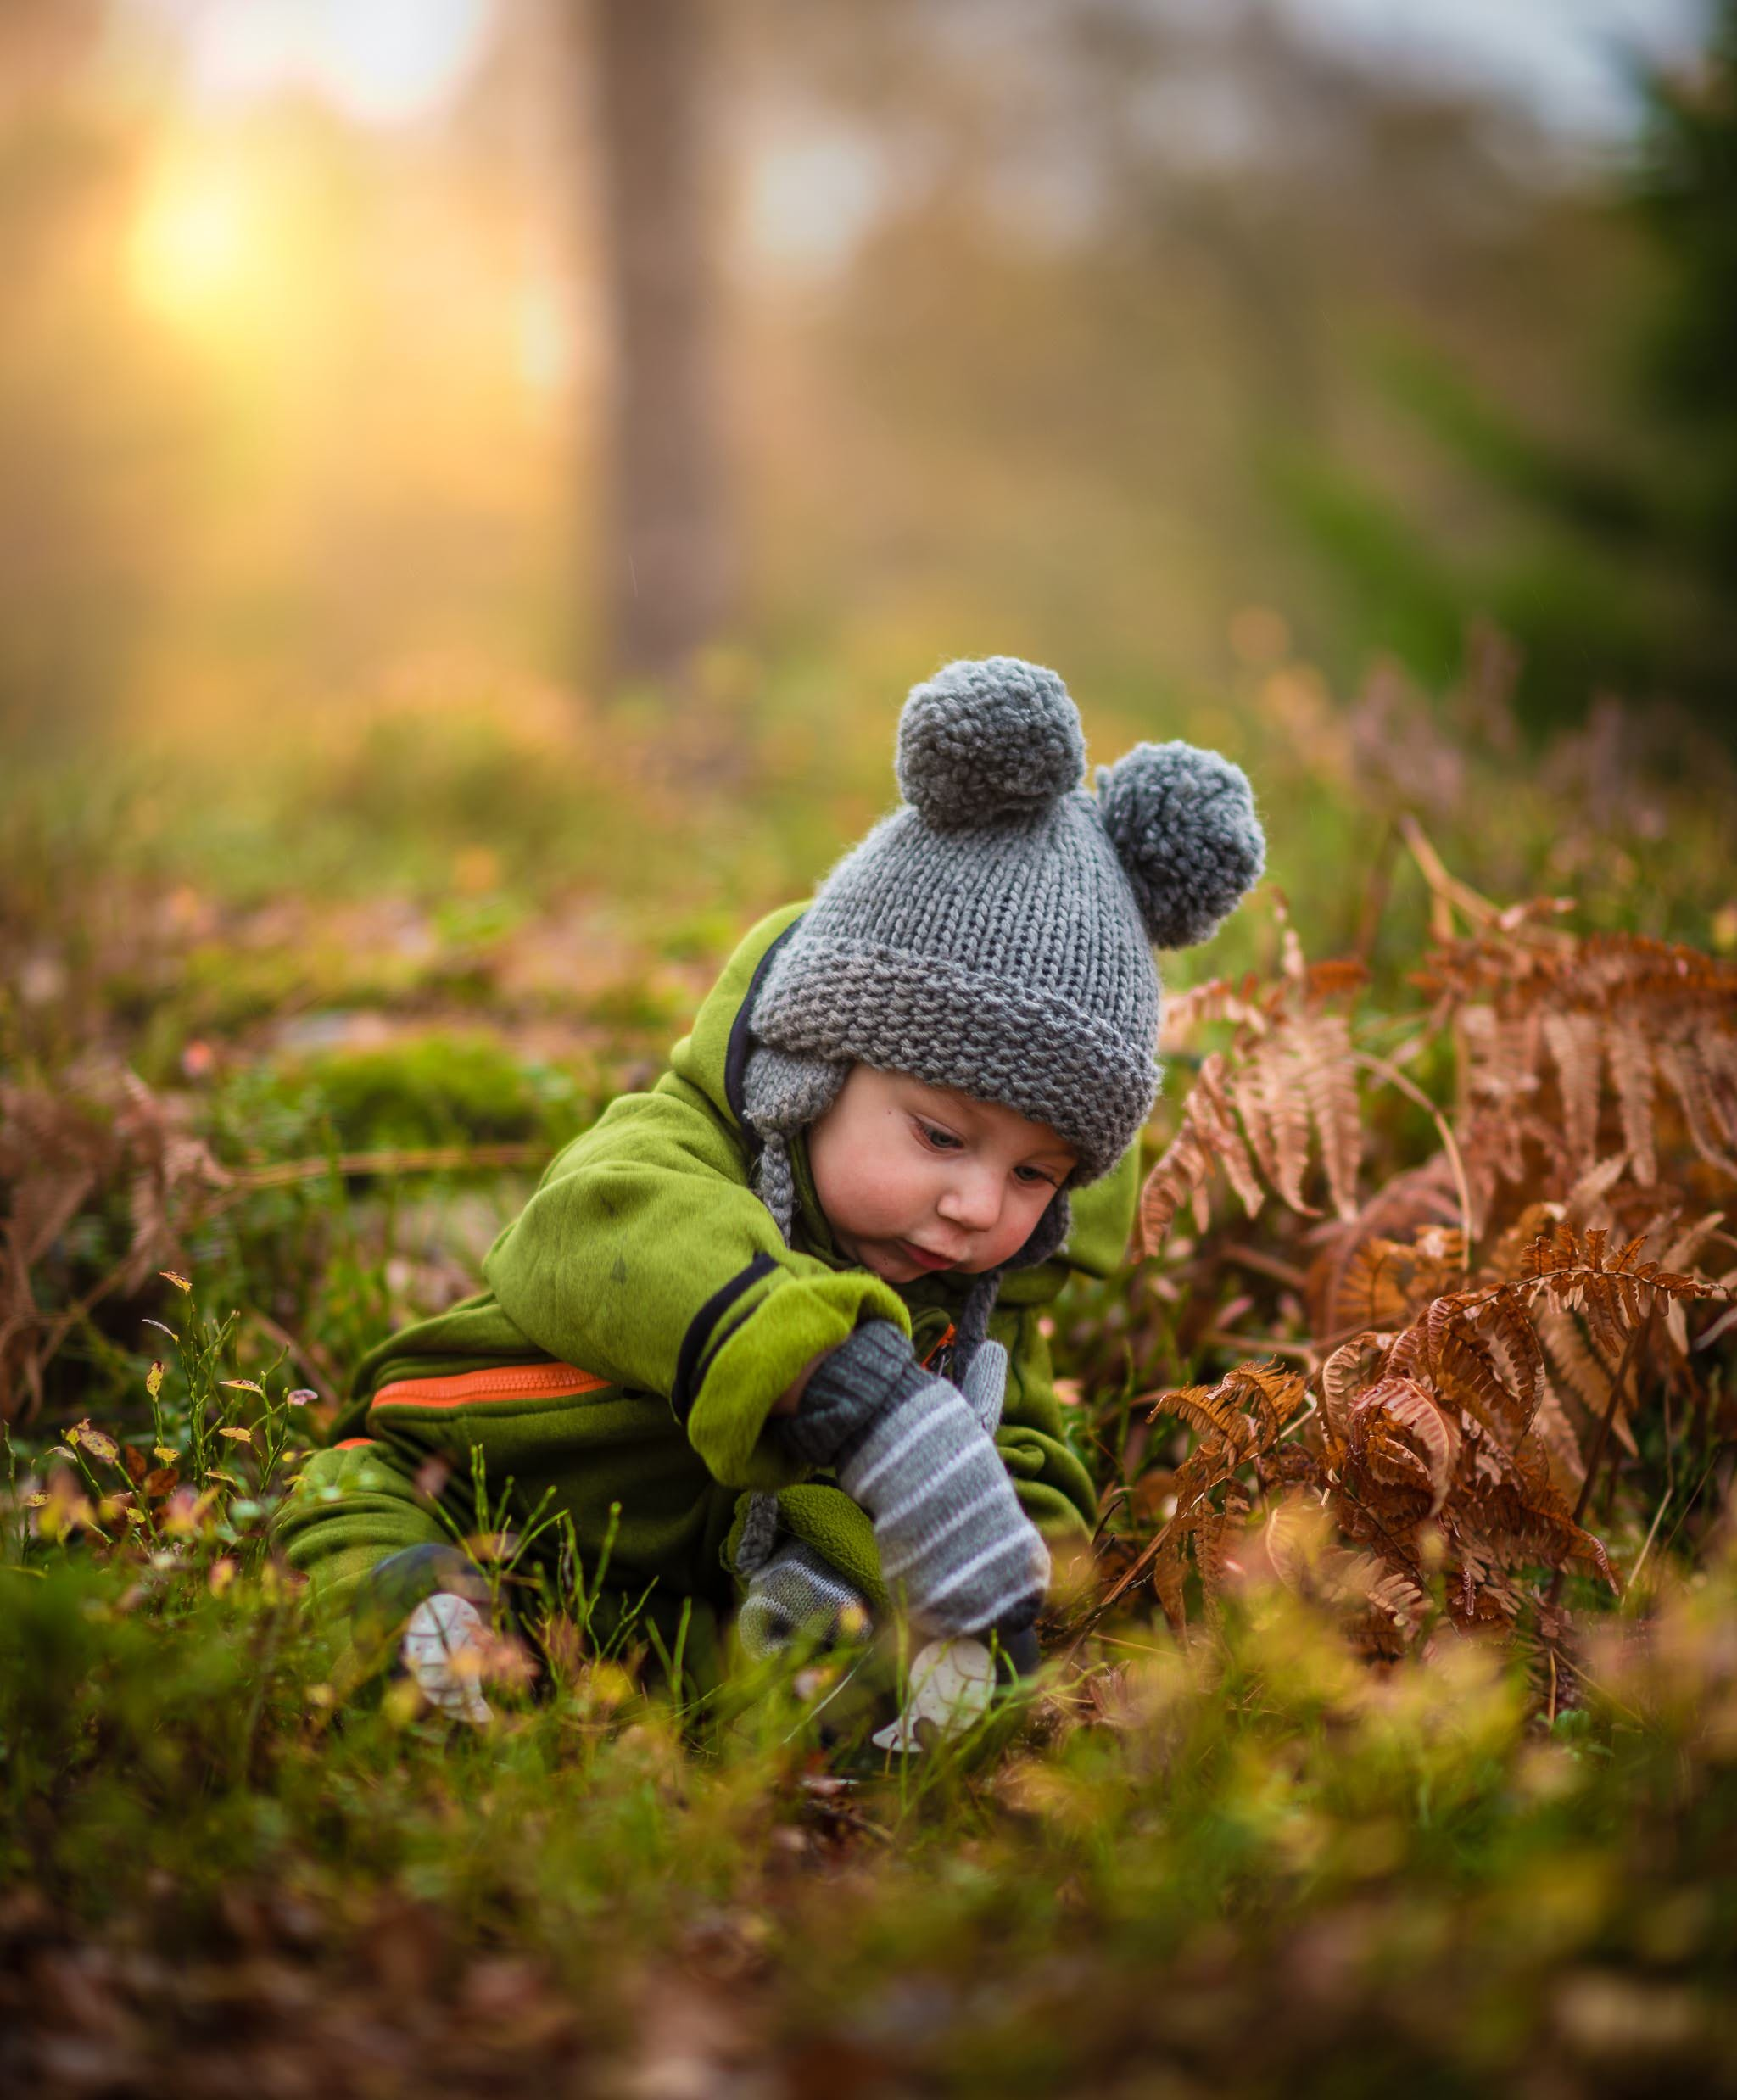 Kostenloses Stock Foto zu baby, bezaubernd, fokus, freizeit